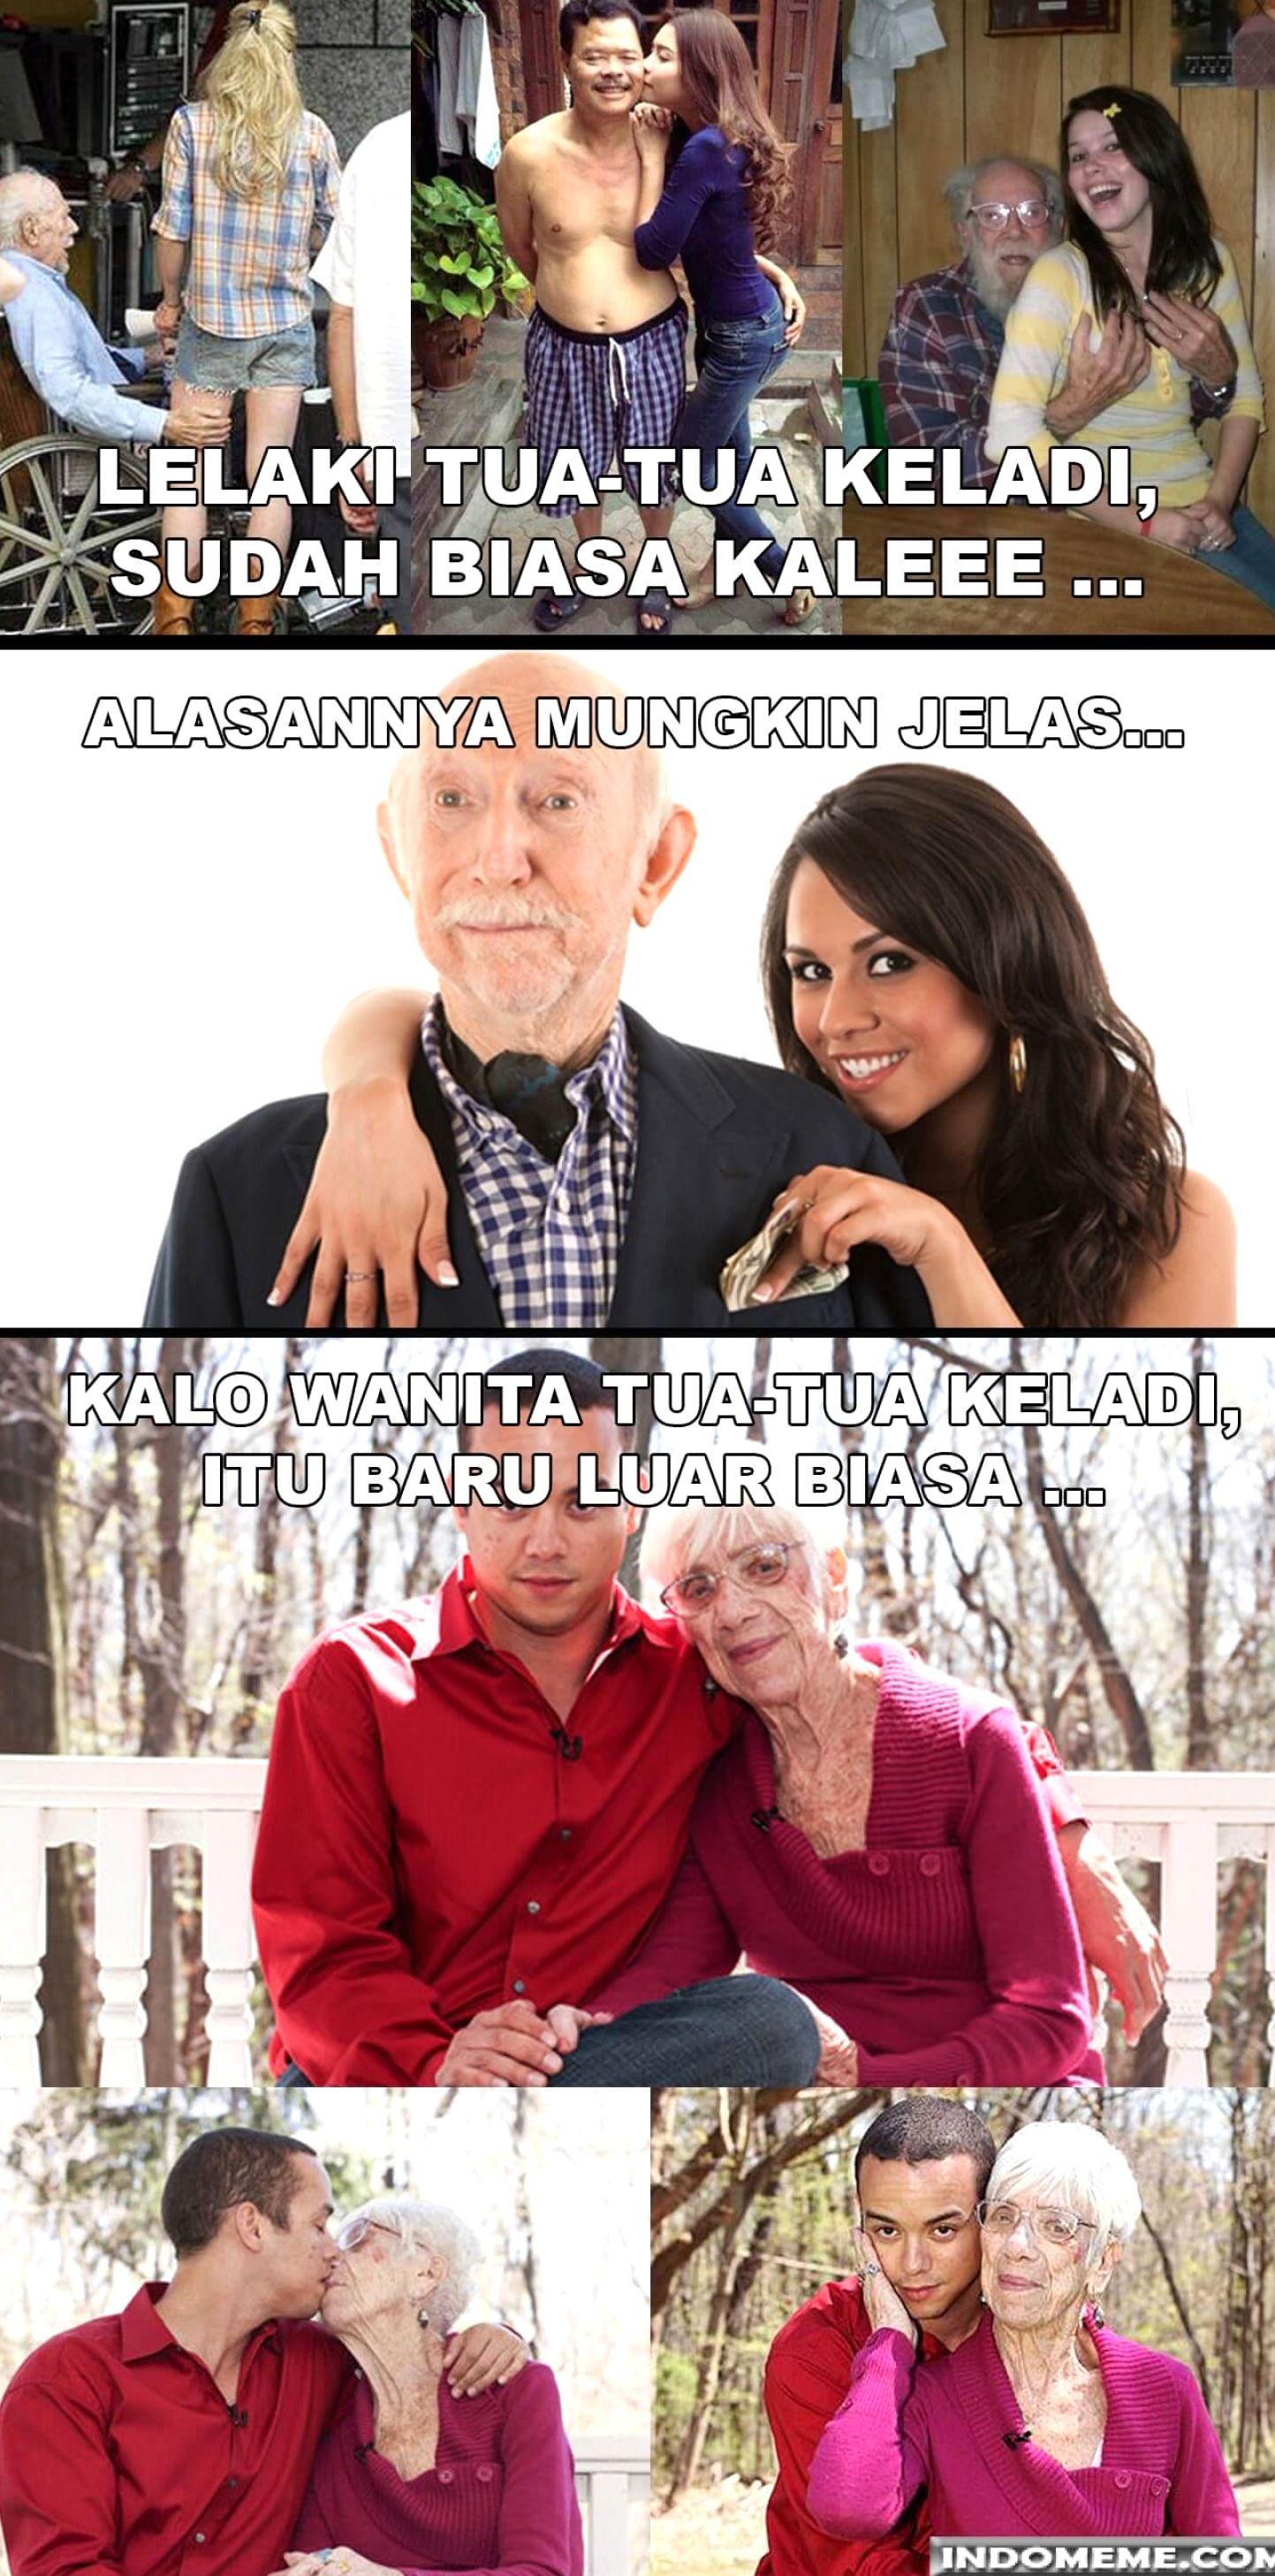 20 Meme Lucu Gambar Ngakak Bikin Ketawa Gambarnya Lucu In 2021 Jokes Funny Memes